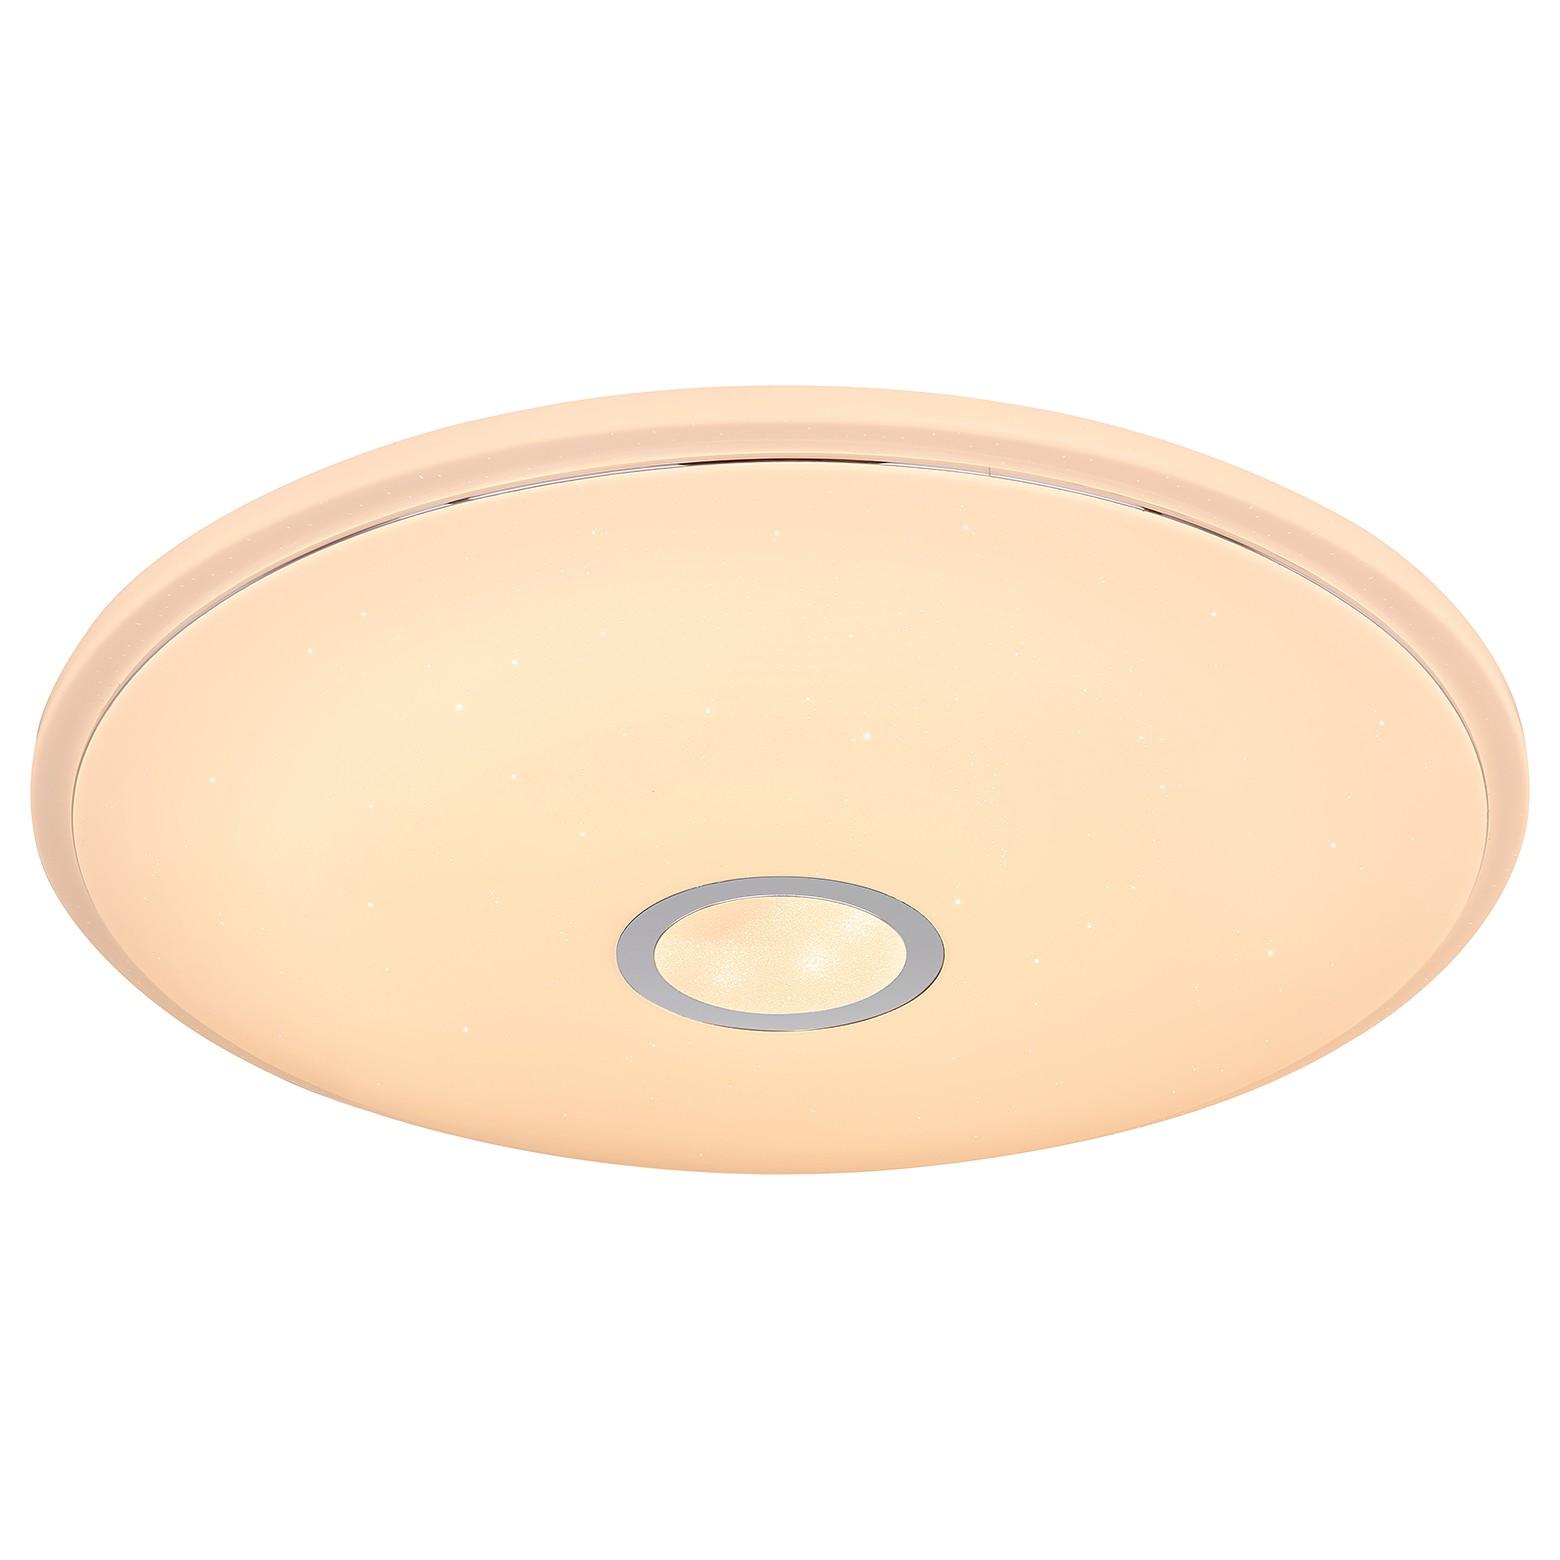 home24 LED-Deckenleuchte Lamon